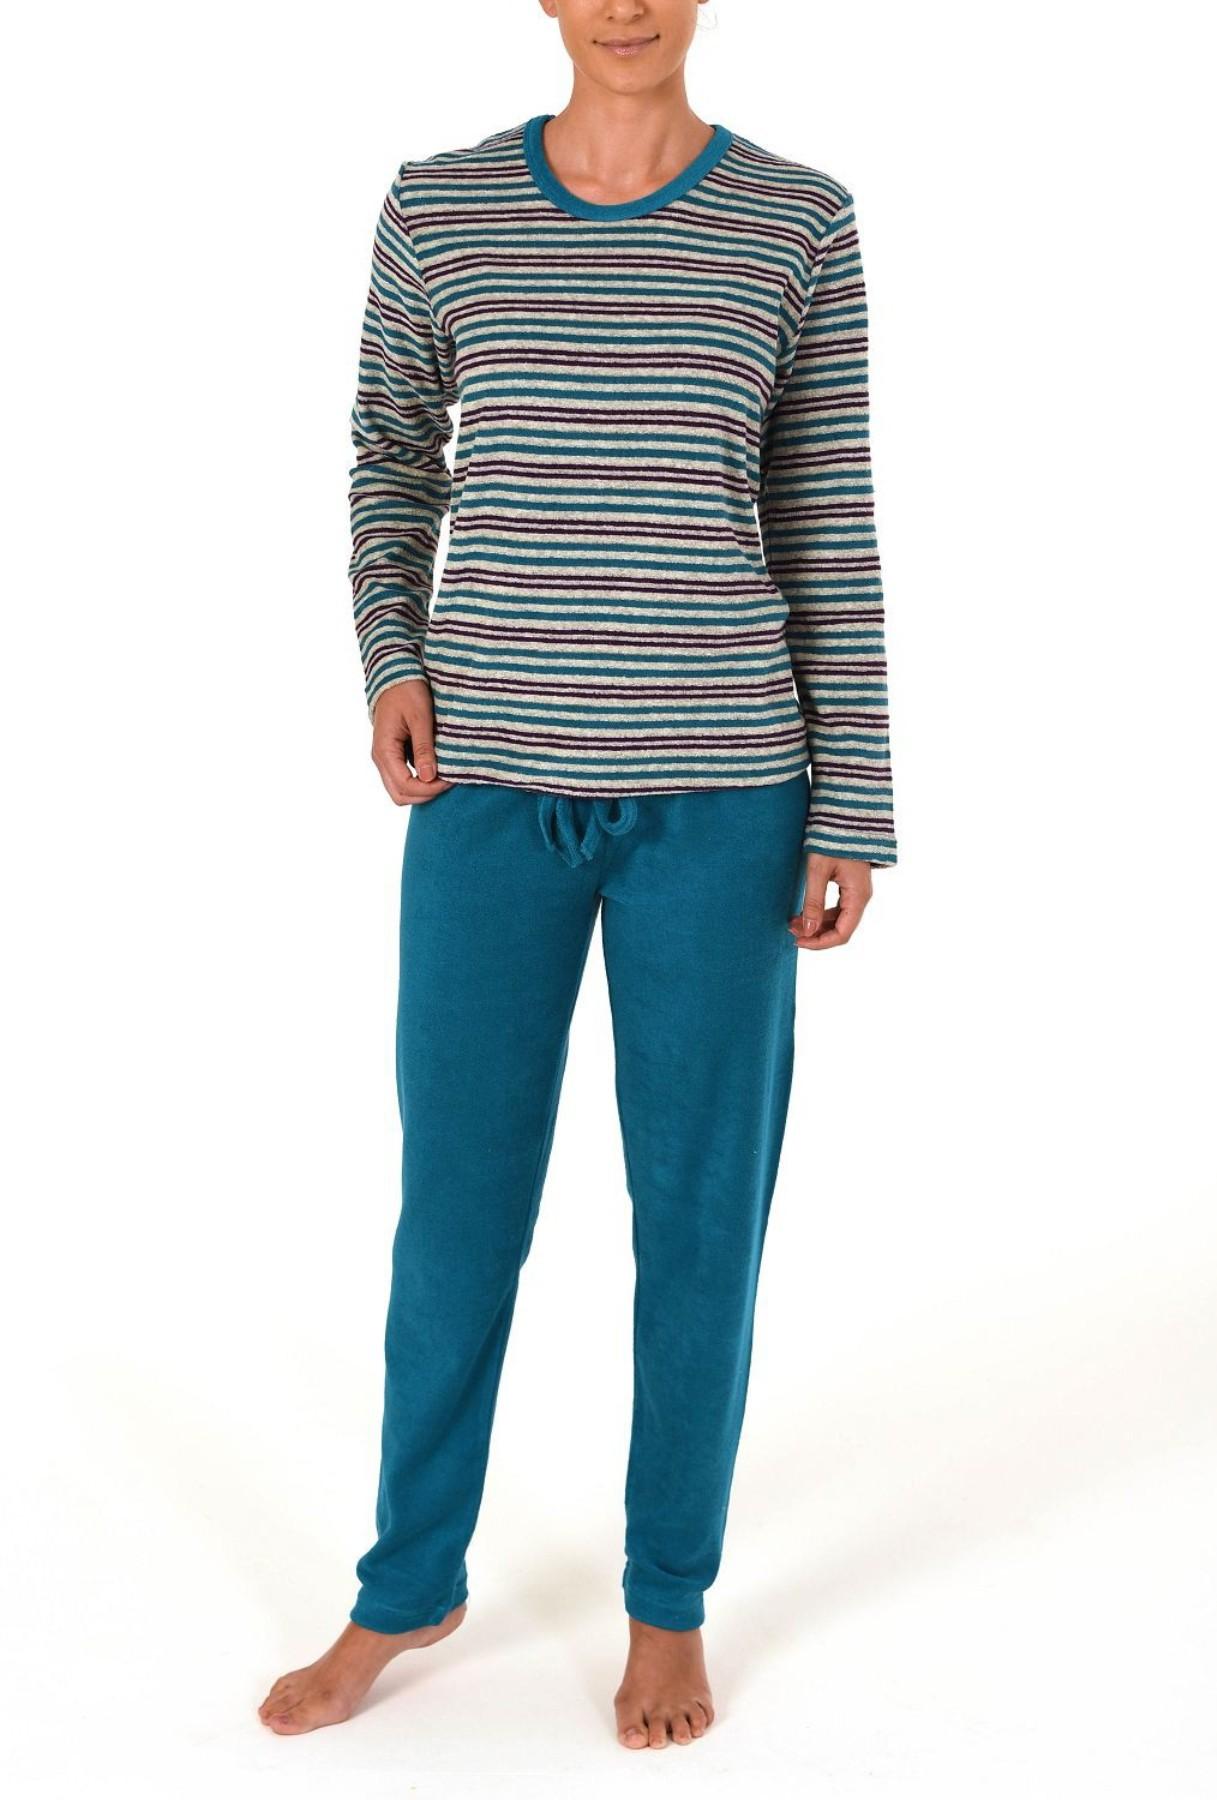 Damen Frottee Pyjama lang mit Bindeband – Streifendesign – 59497 – Bild 2